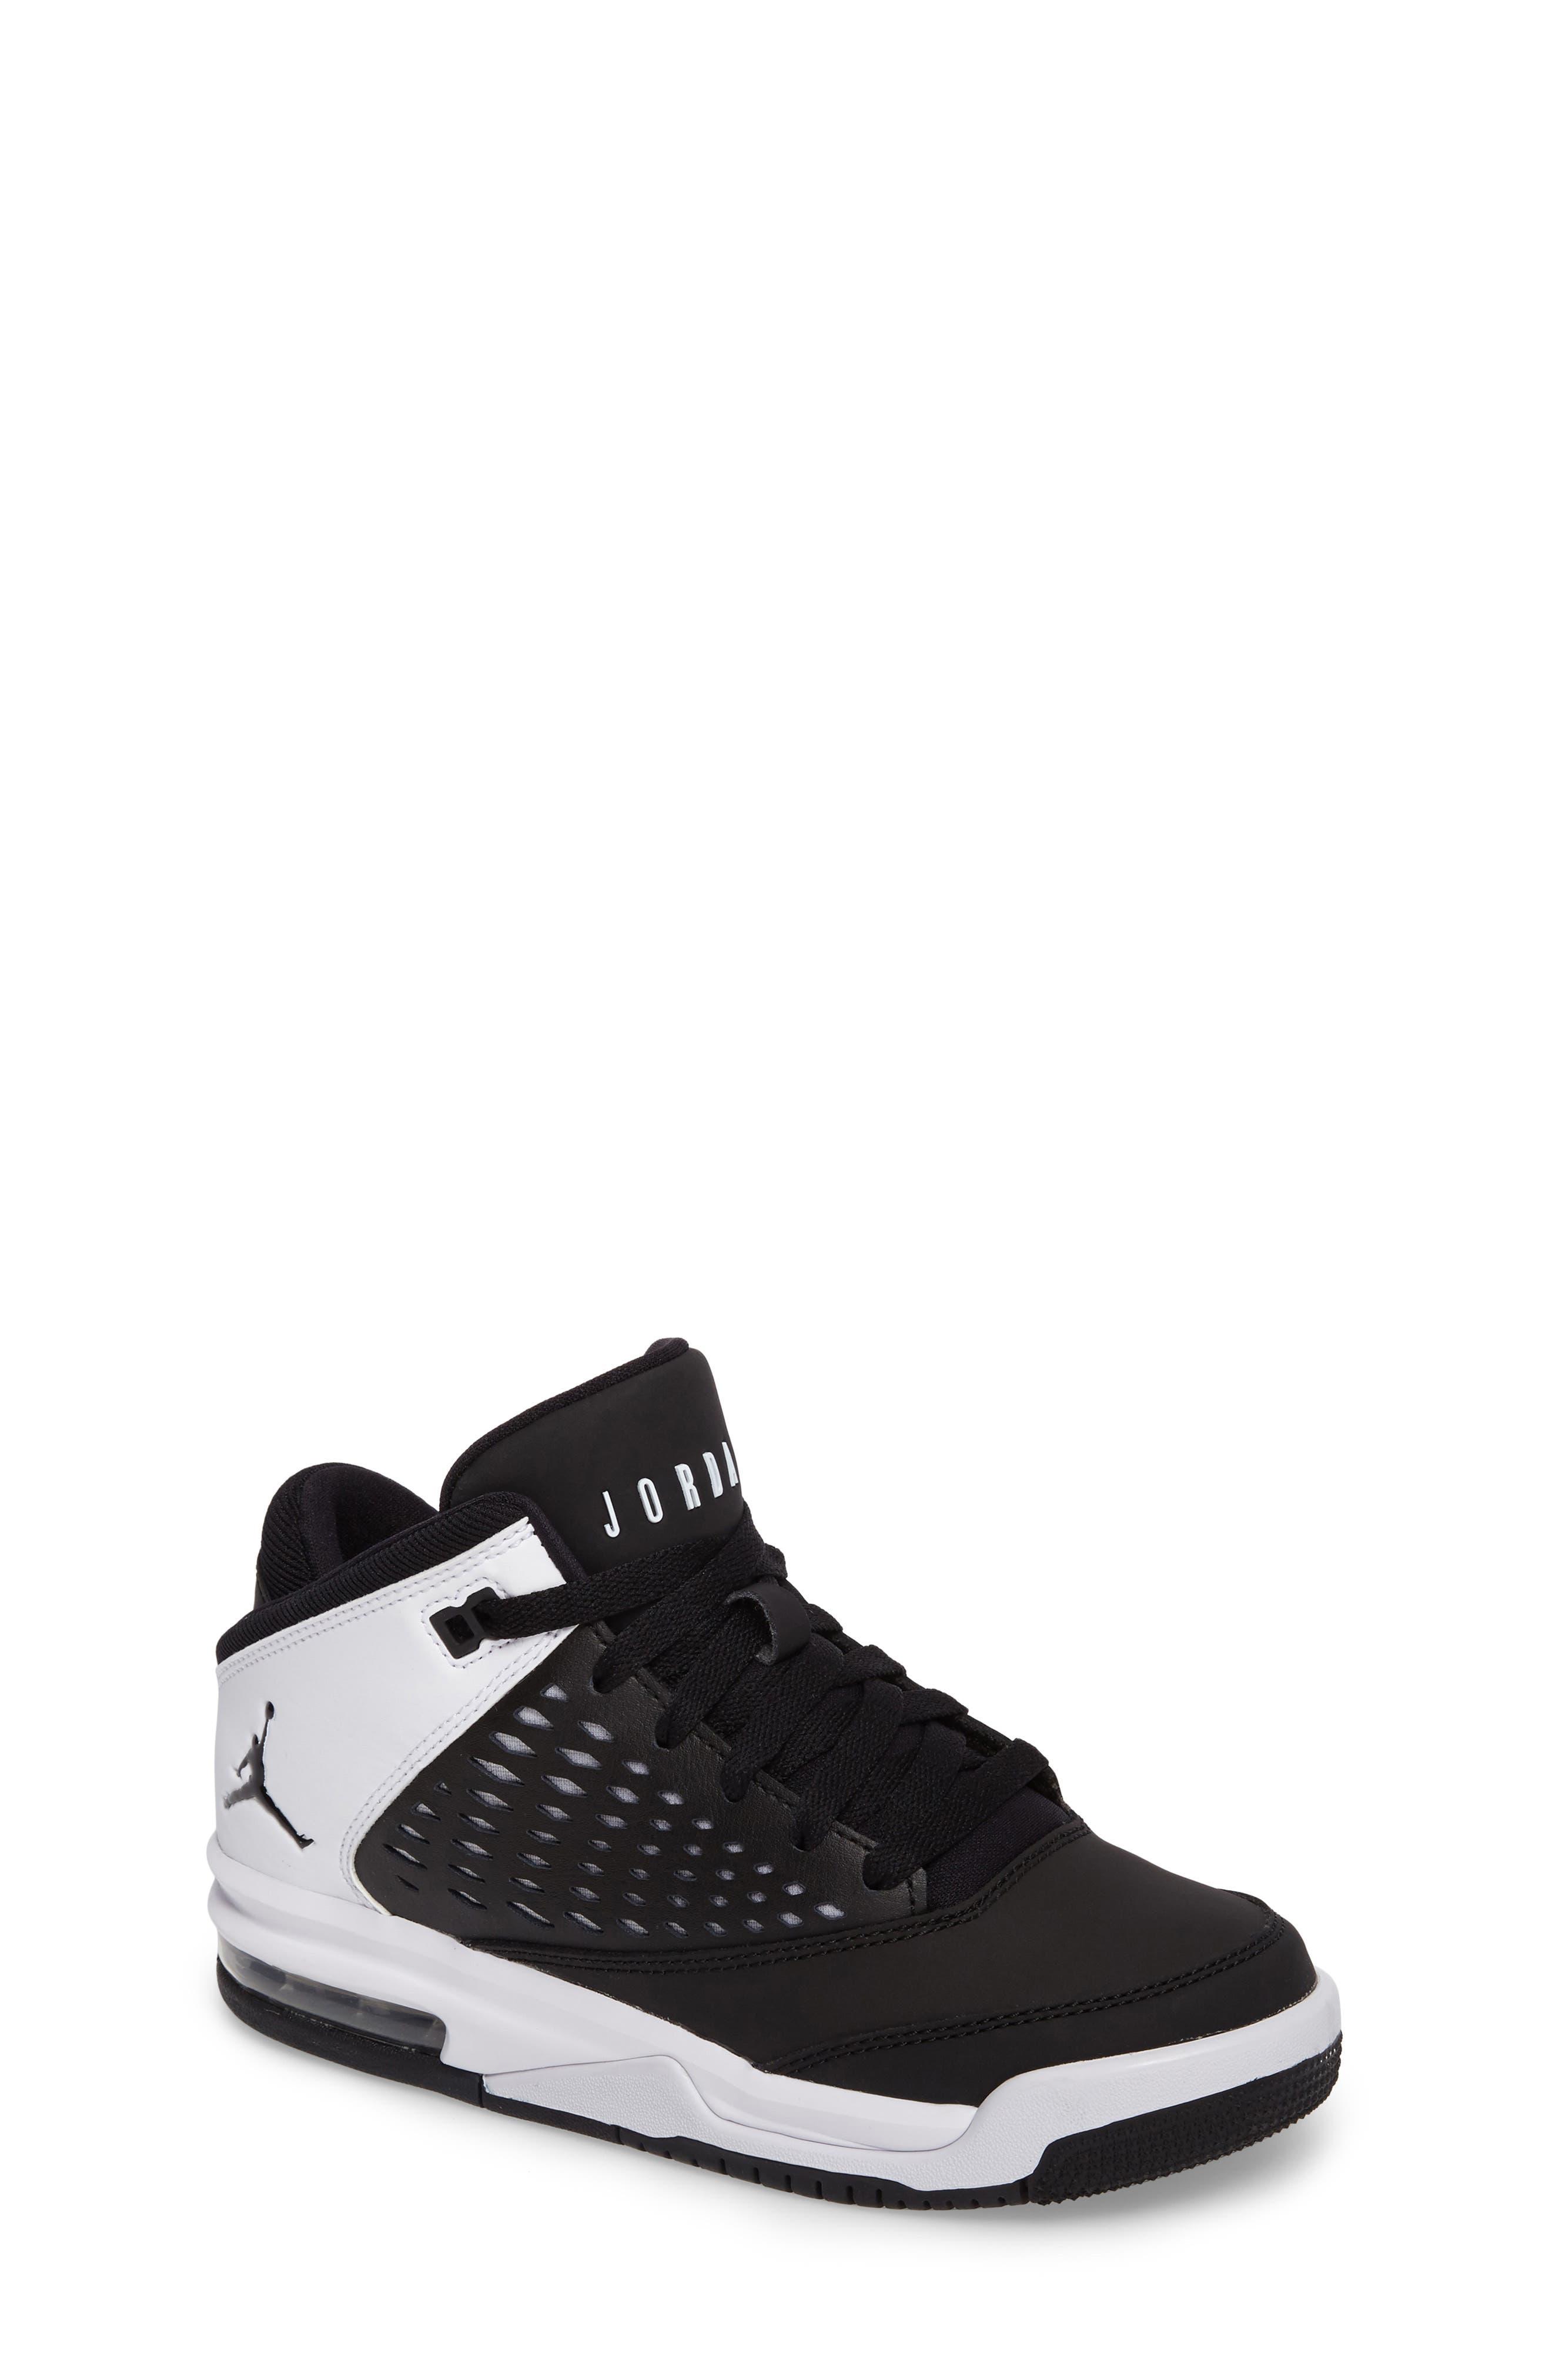 Nike Jordan Flight Origin Sneaker (Big Kid)